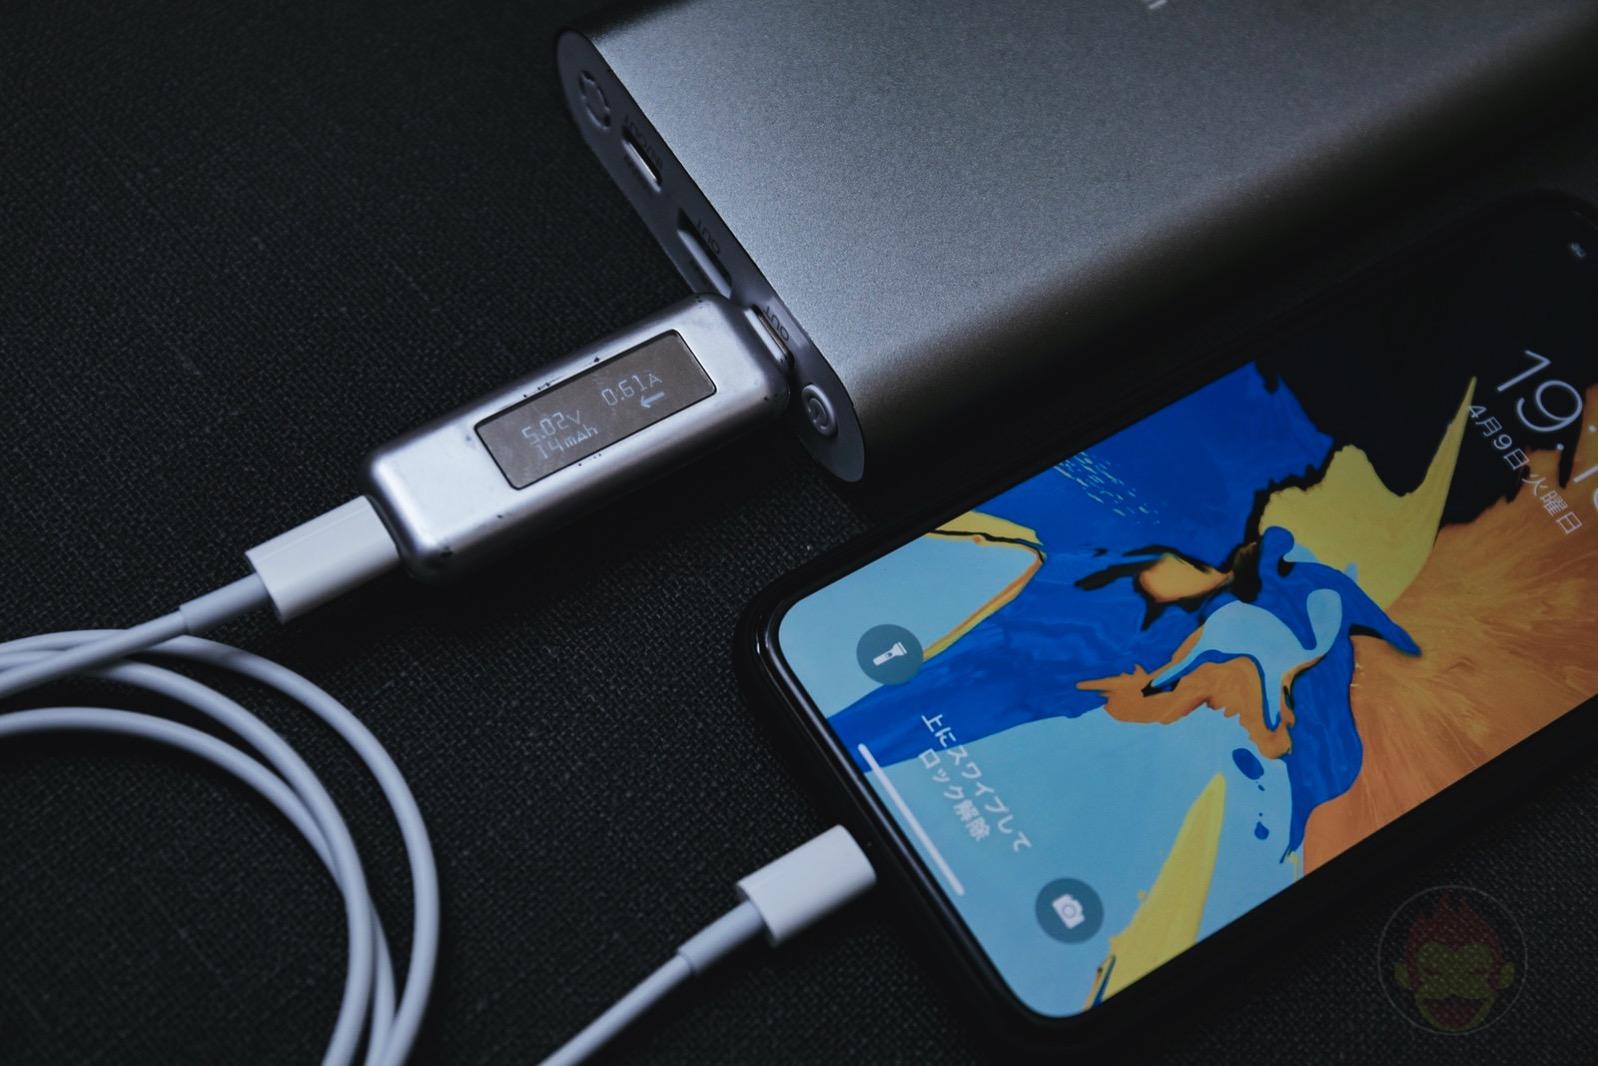 HyperJuice-100W-Mobile-Battery-Review-14.jpg